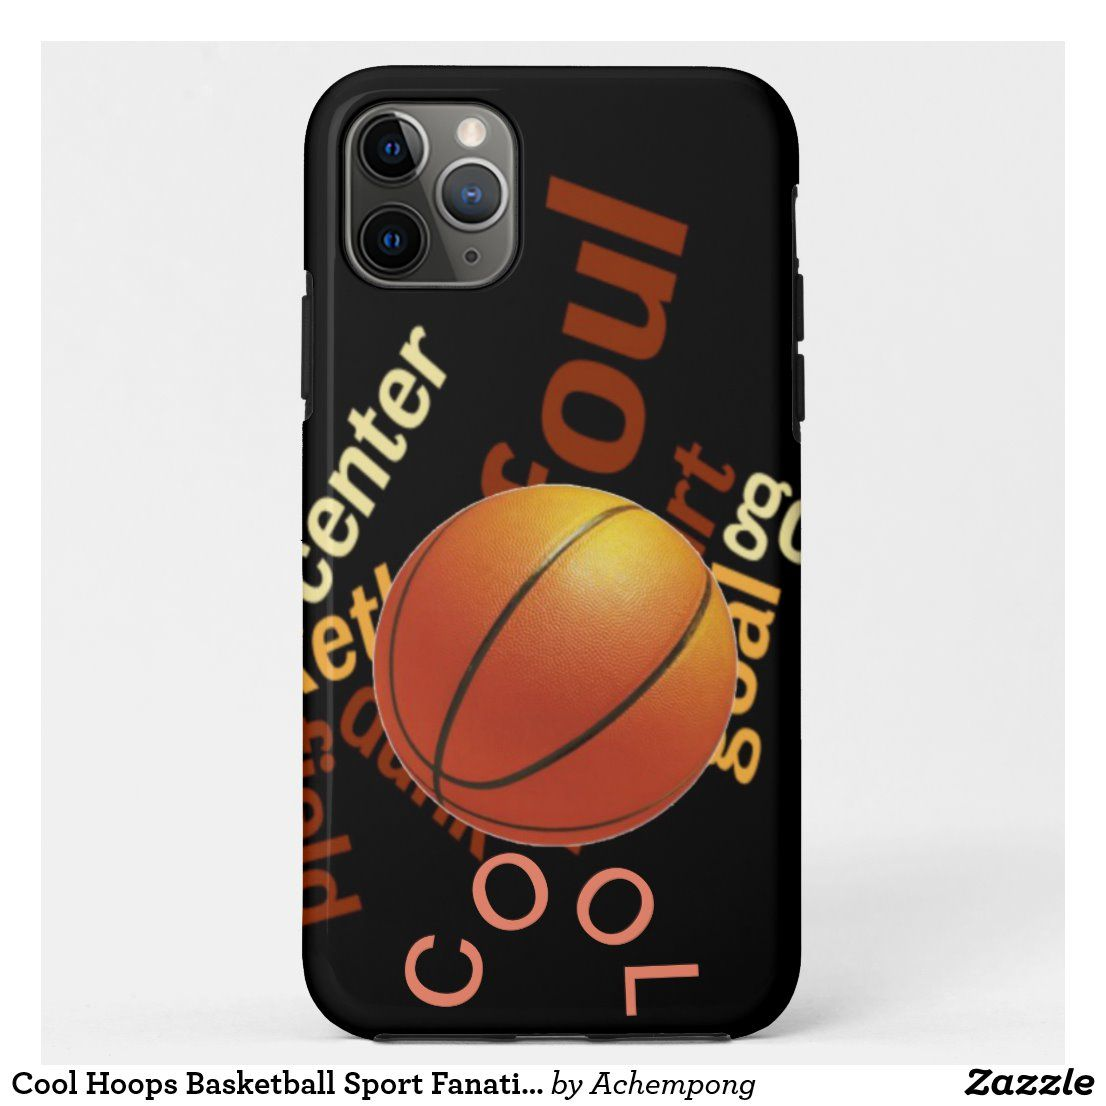 Cool hoops basketball sport fanatics casemate iphone case